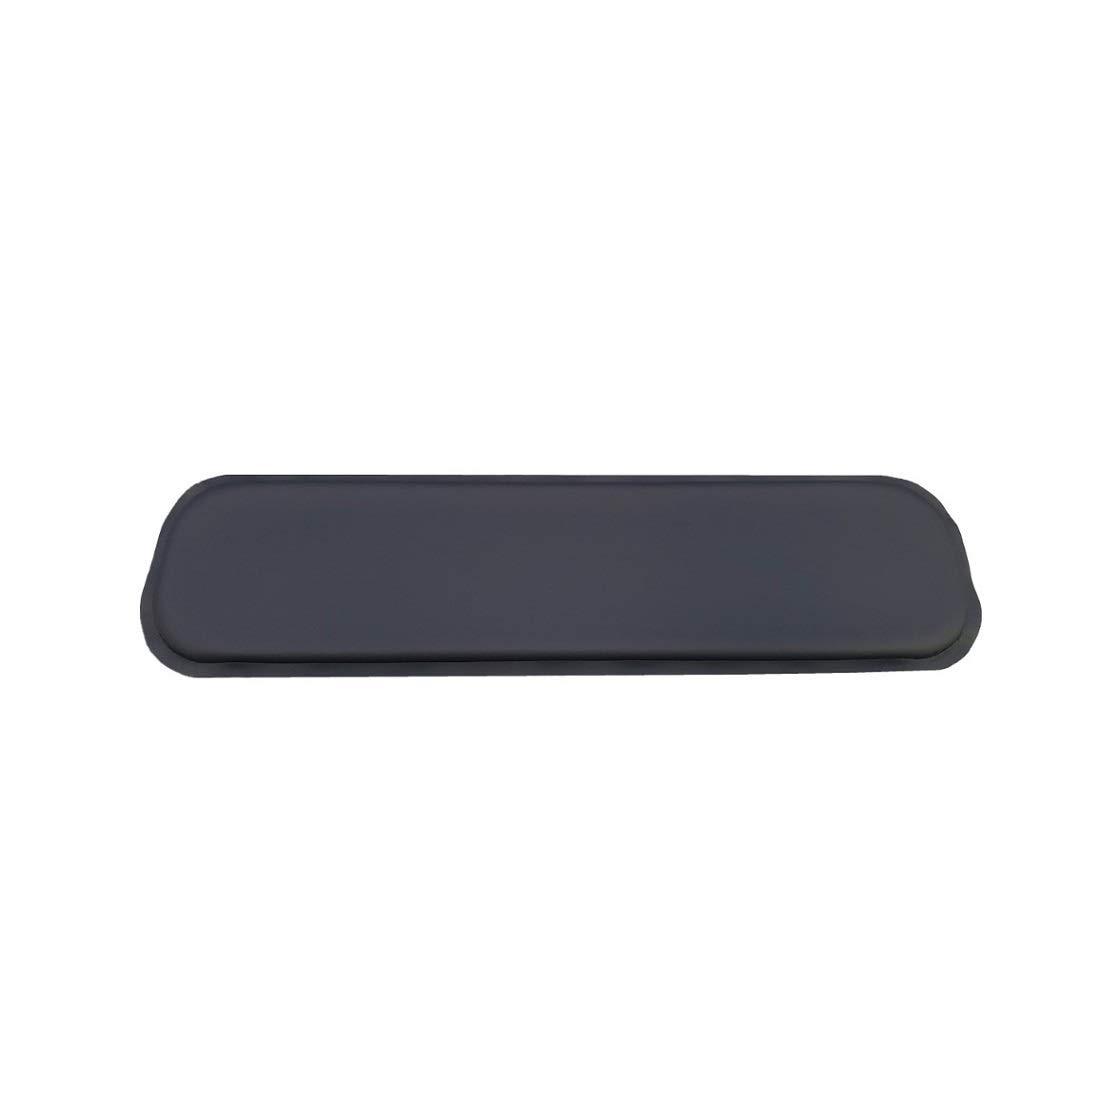 ULTRAGEL''Gaming'' Super Comfy Arm/Elbow/Wrist Rest Gel Pad (Lap Top 4.5x15.5, Black)